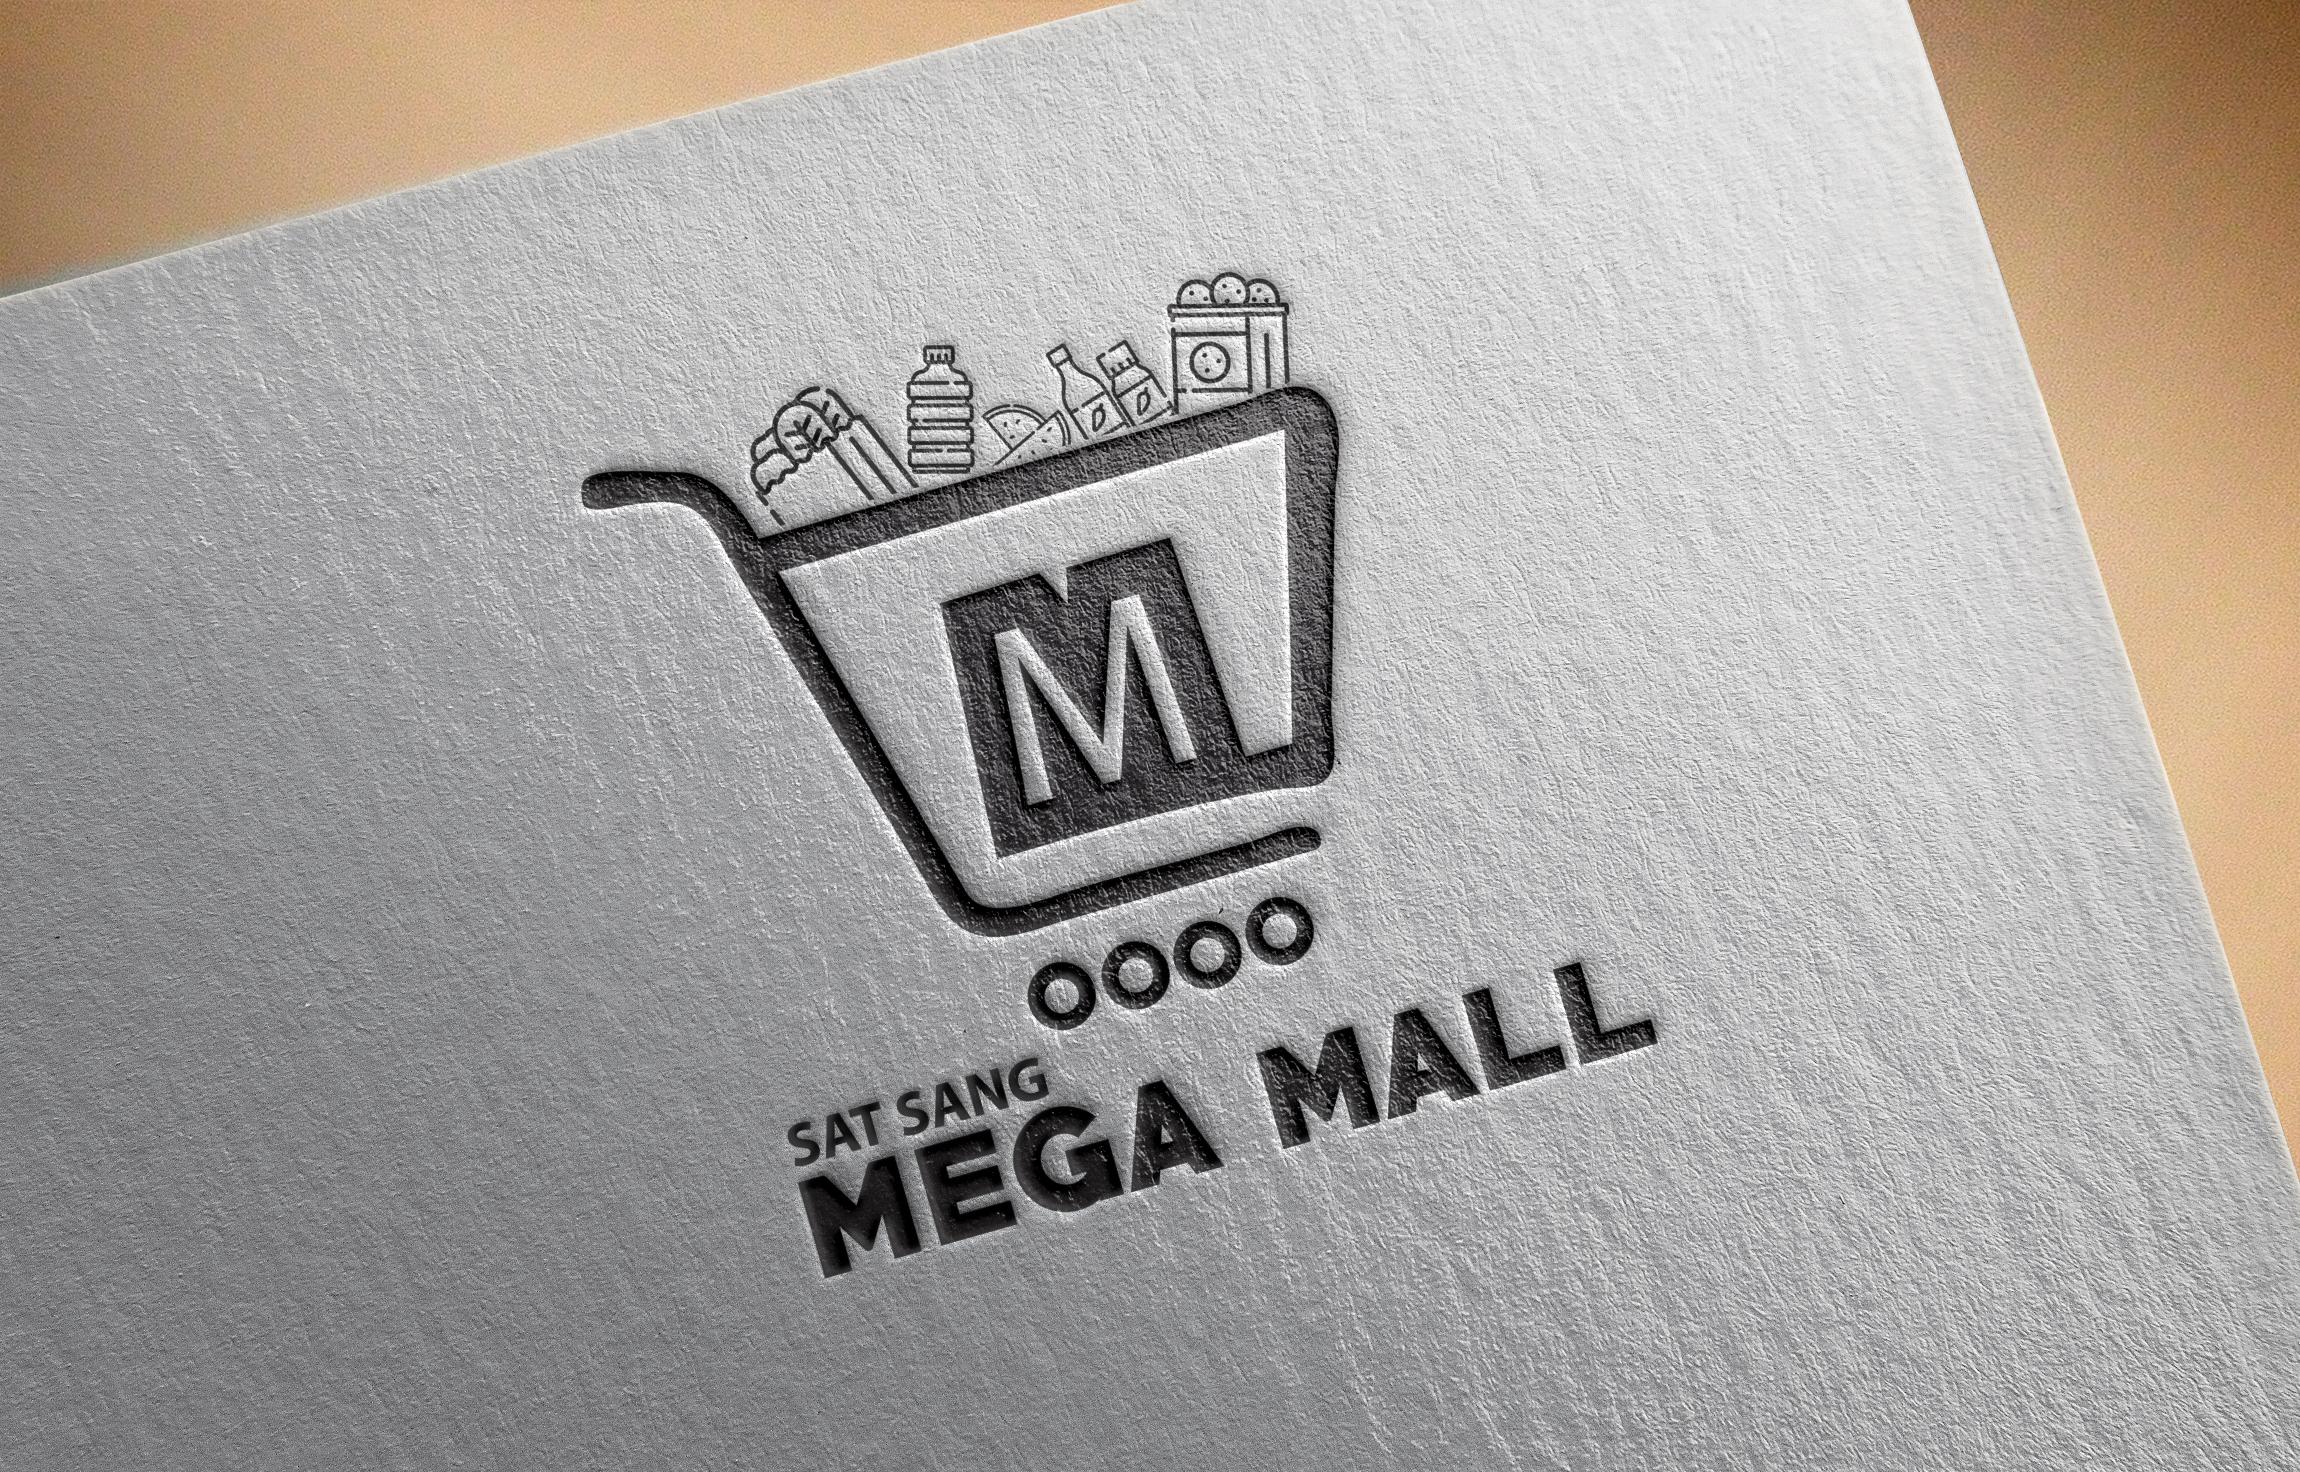 Mega mall logo design by Badri Design